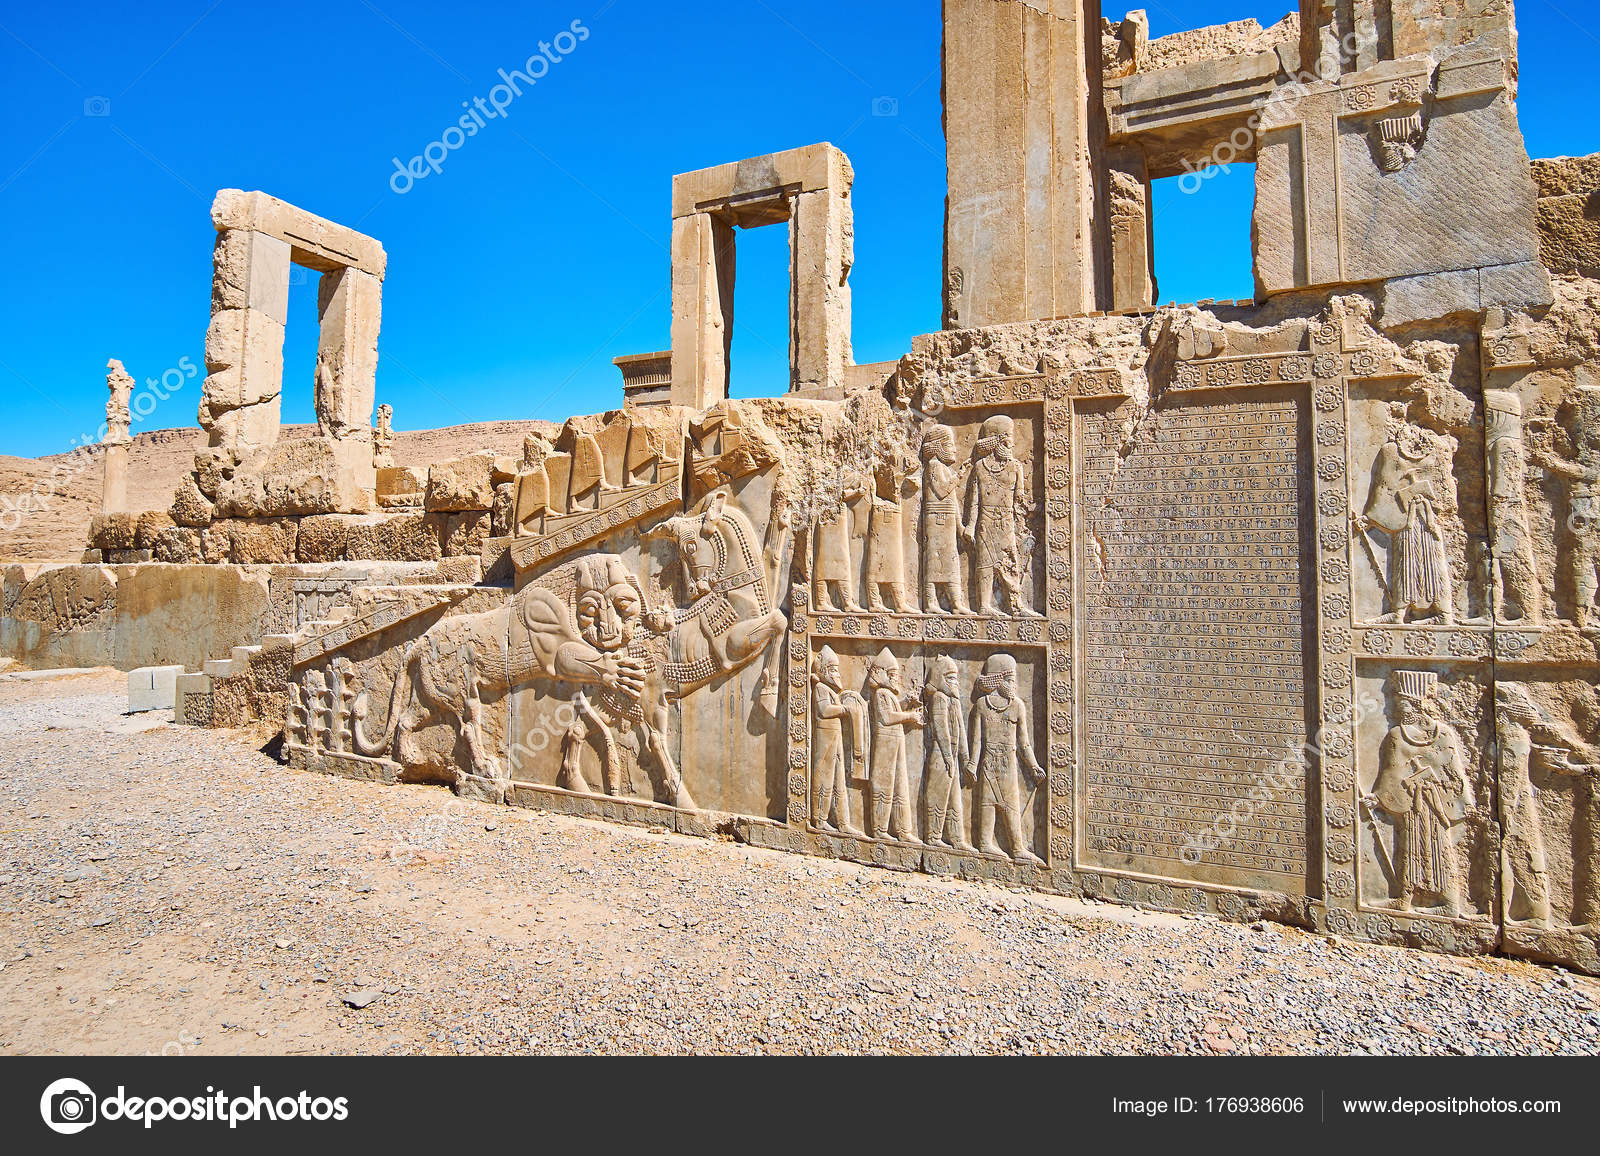 Ancient Art In Persepolis Iran Stock Photo C Efesenko 176938606